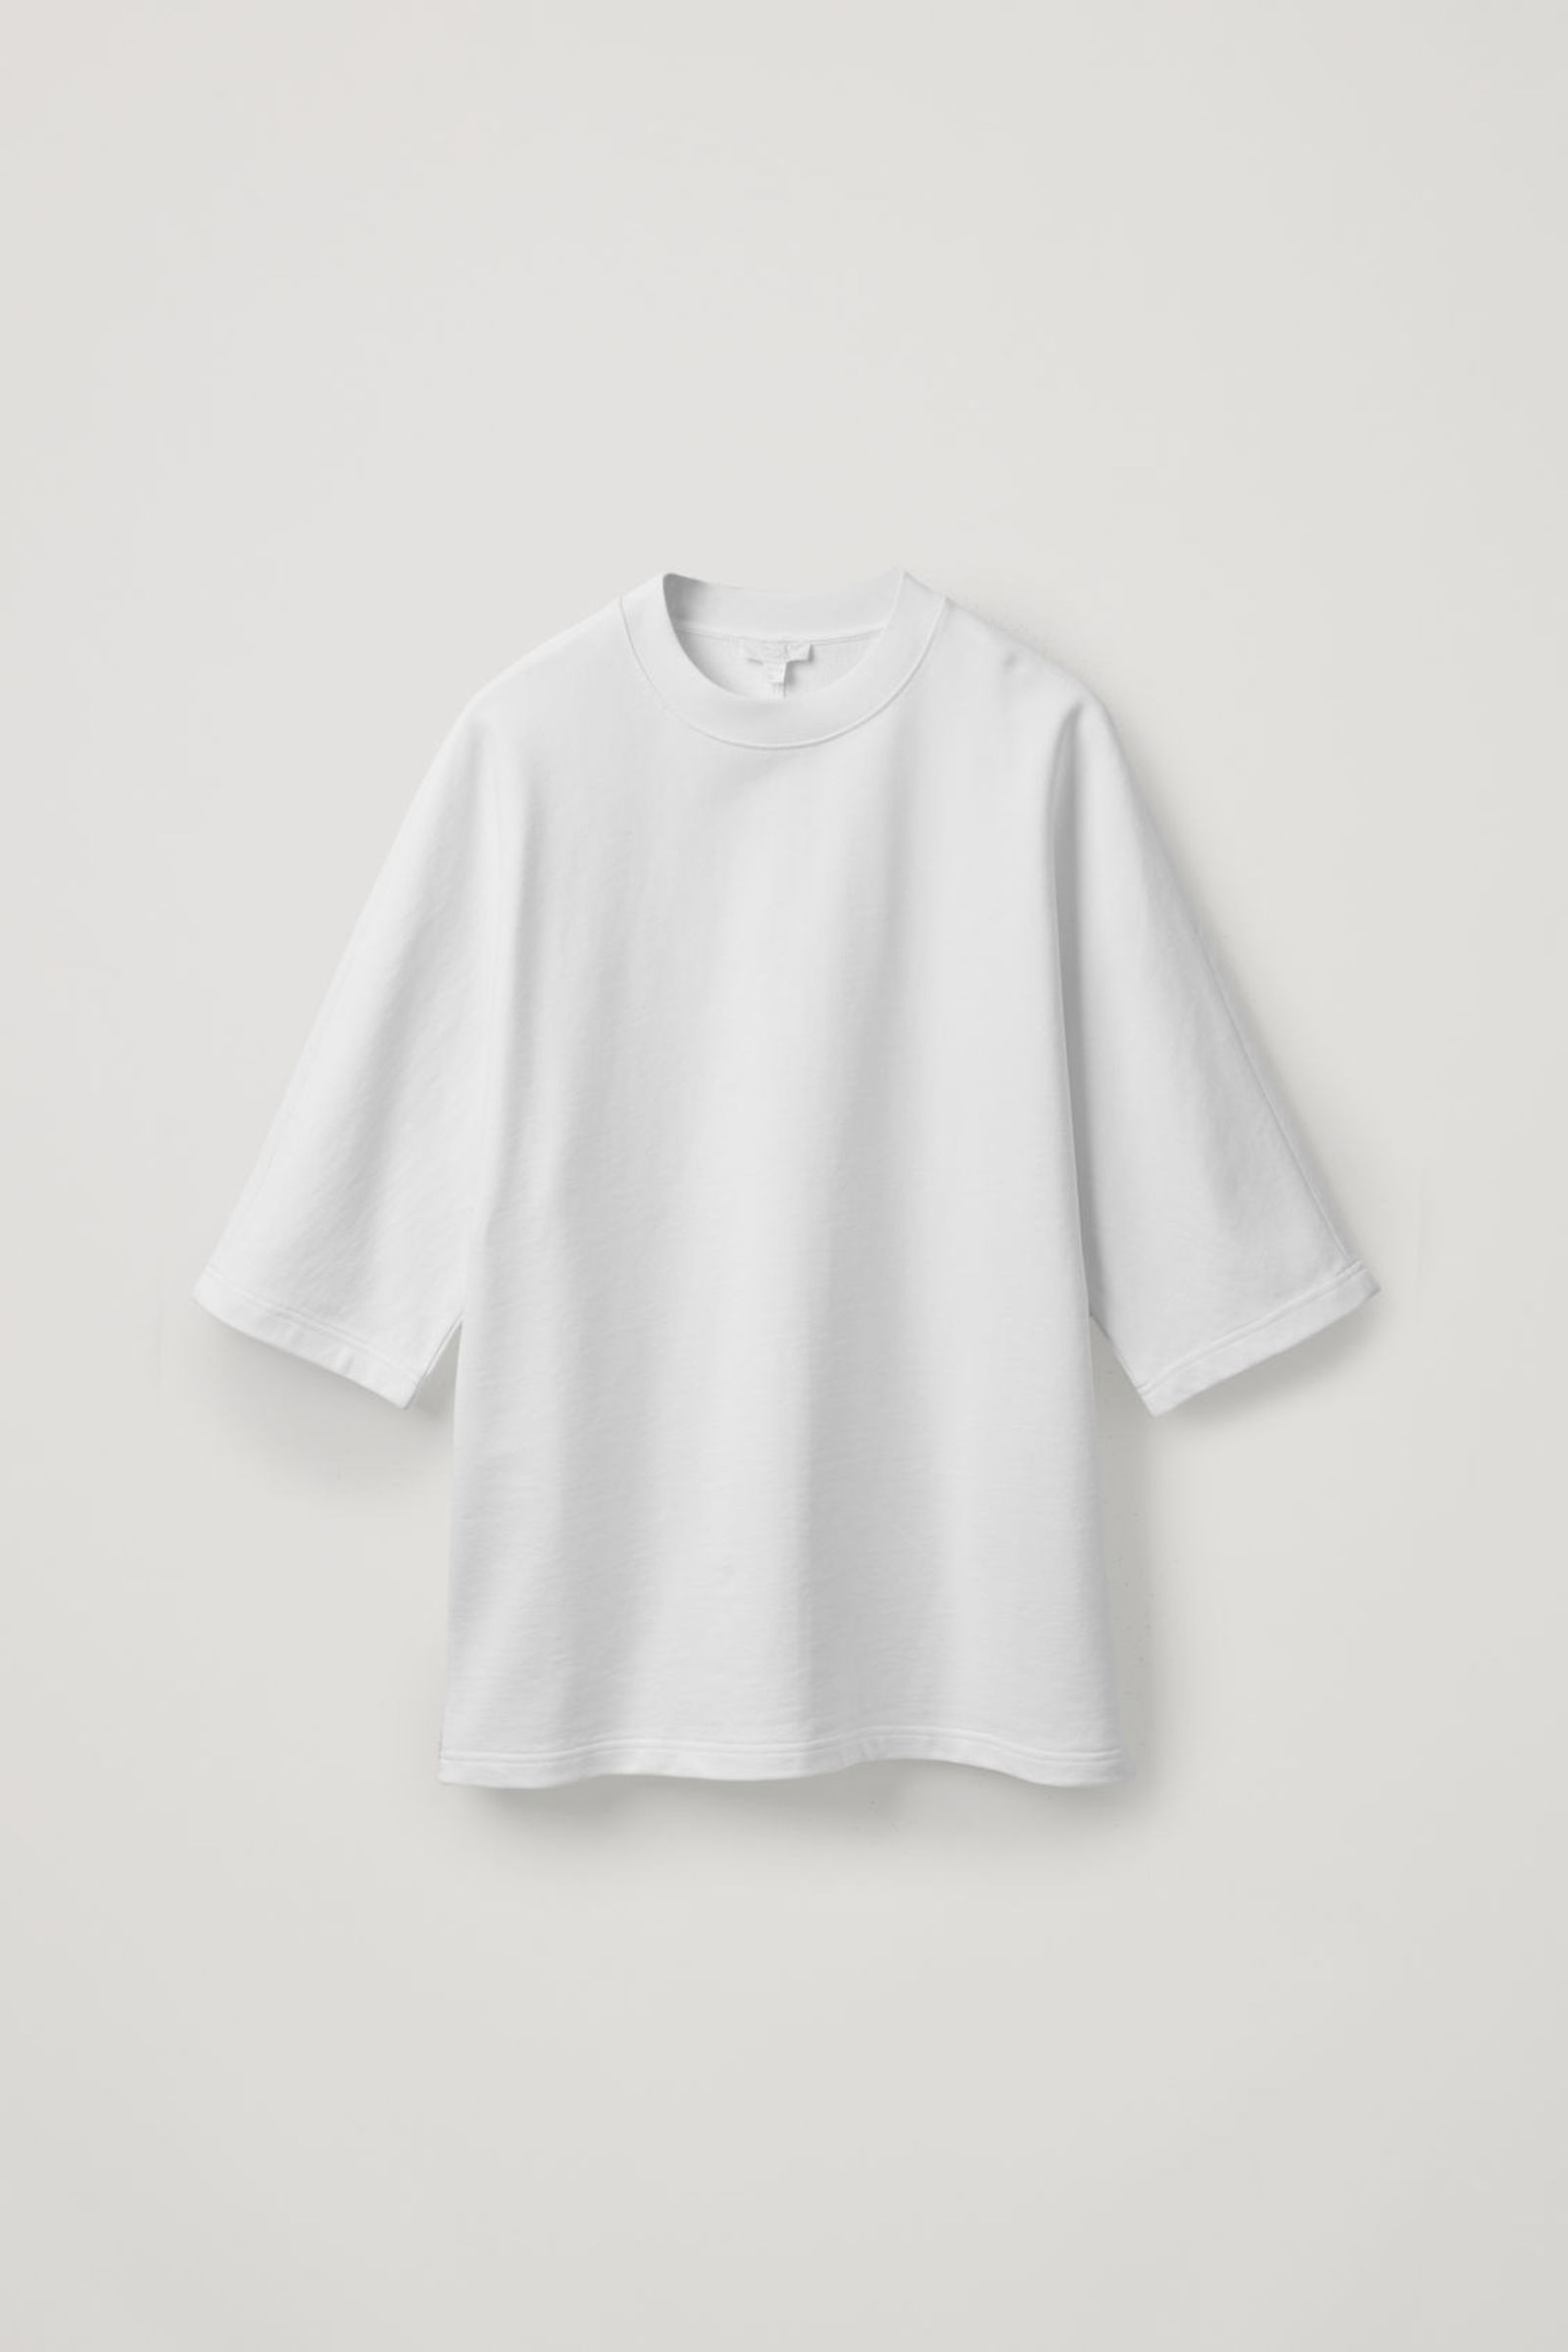 COS 코튼 리넨 저지 티셔츠의 화이트컬러 Product입니다.